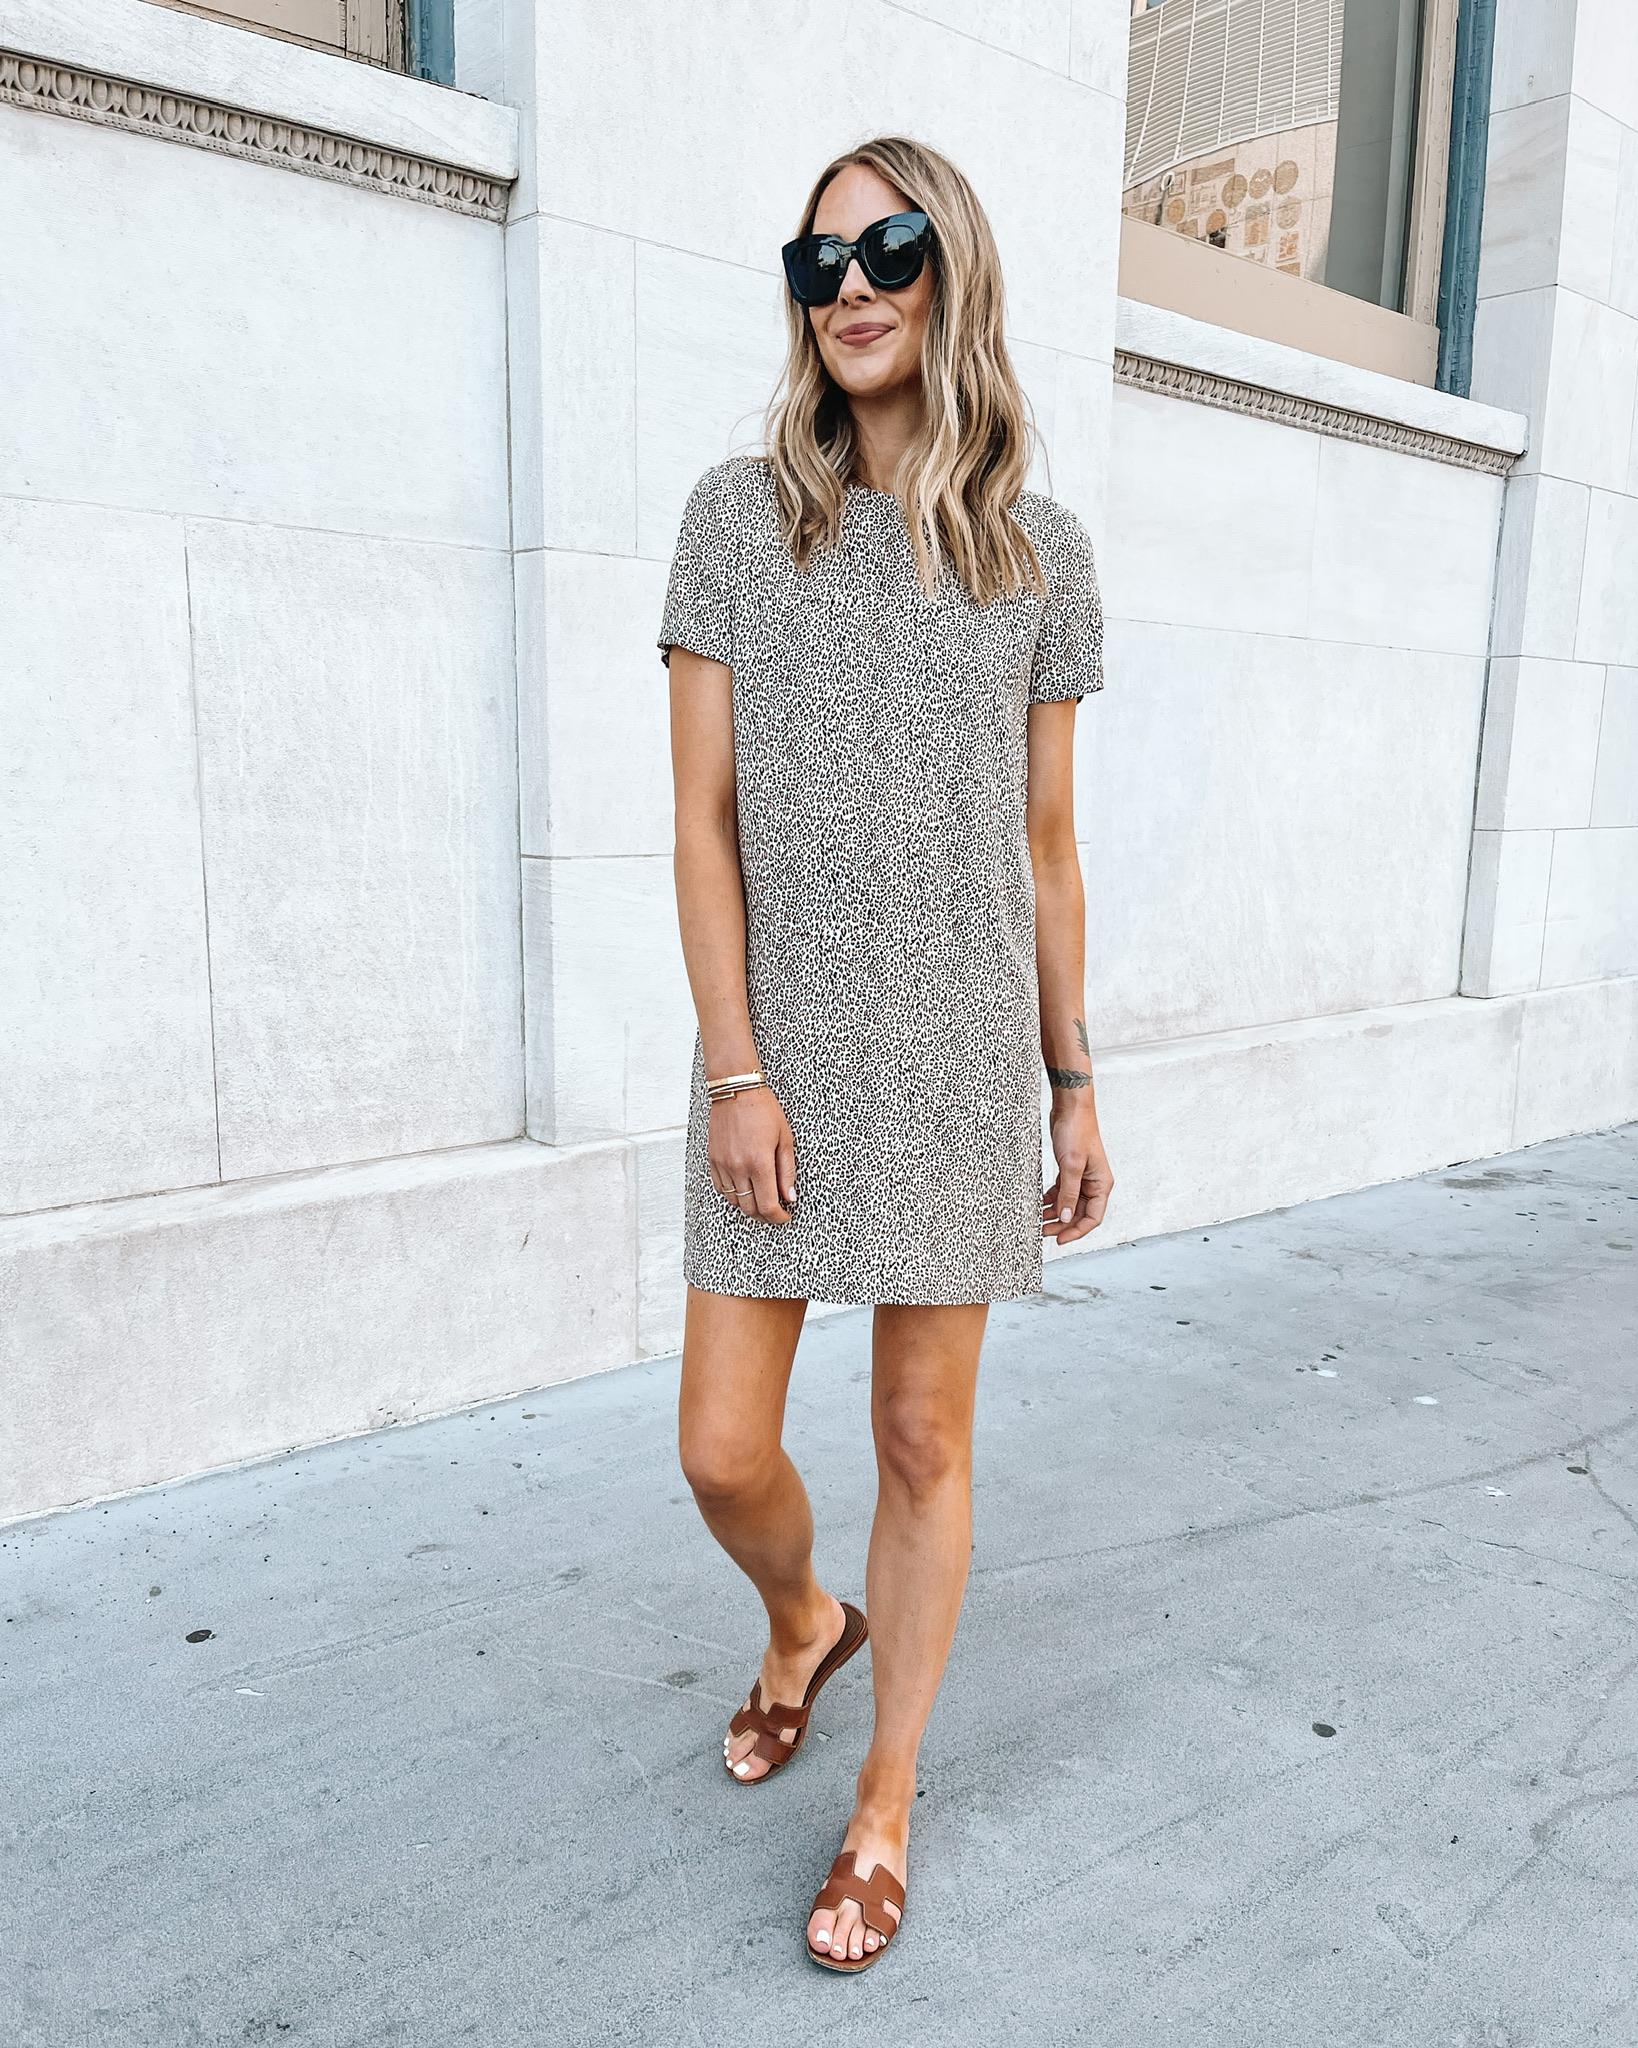 Fashion Jackson Wearing Jenni Kayne Leopard Mini Dress Hermes Oran Gold Sandals Summer Sandals Outfit